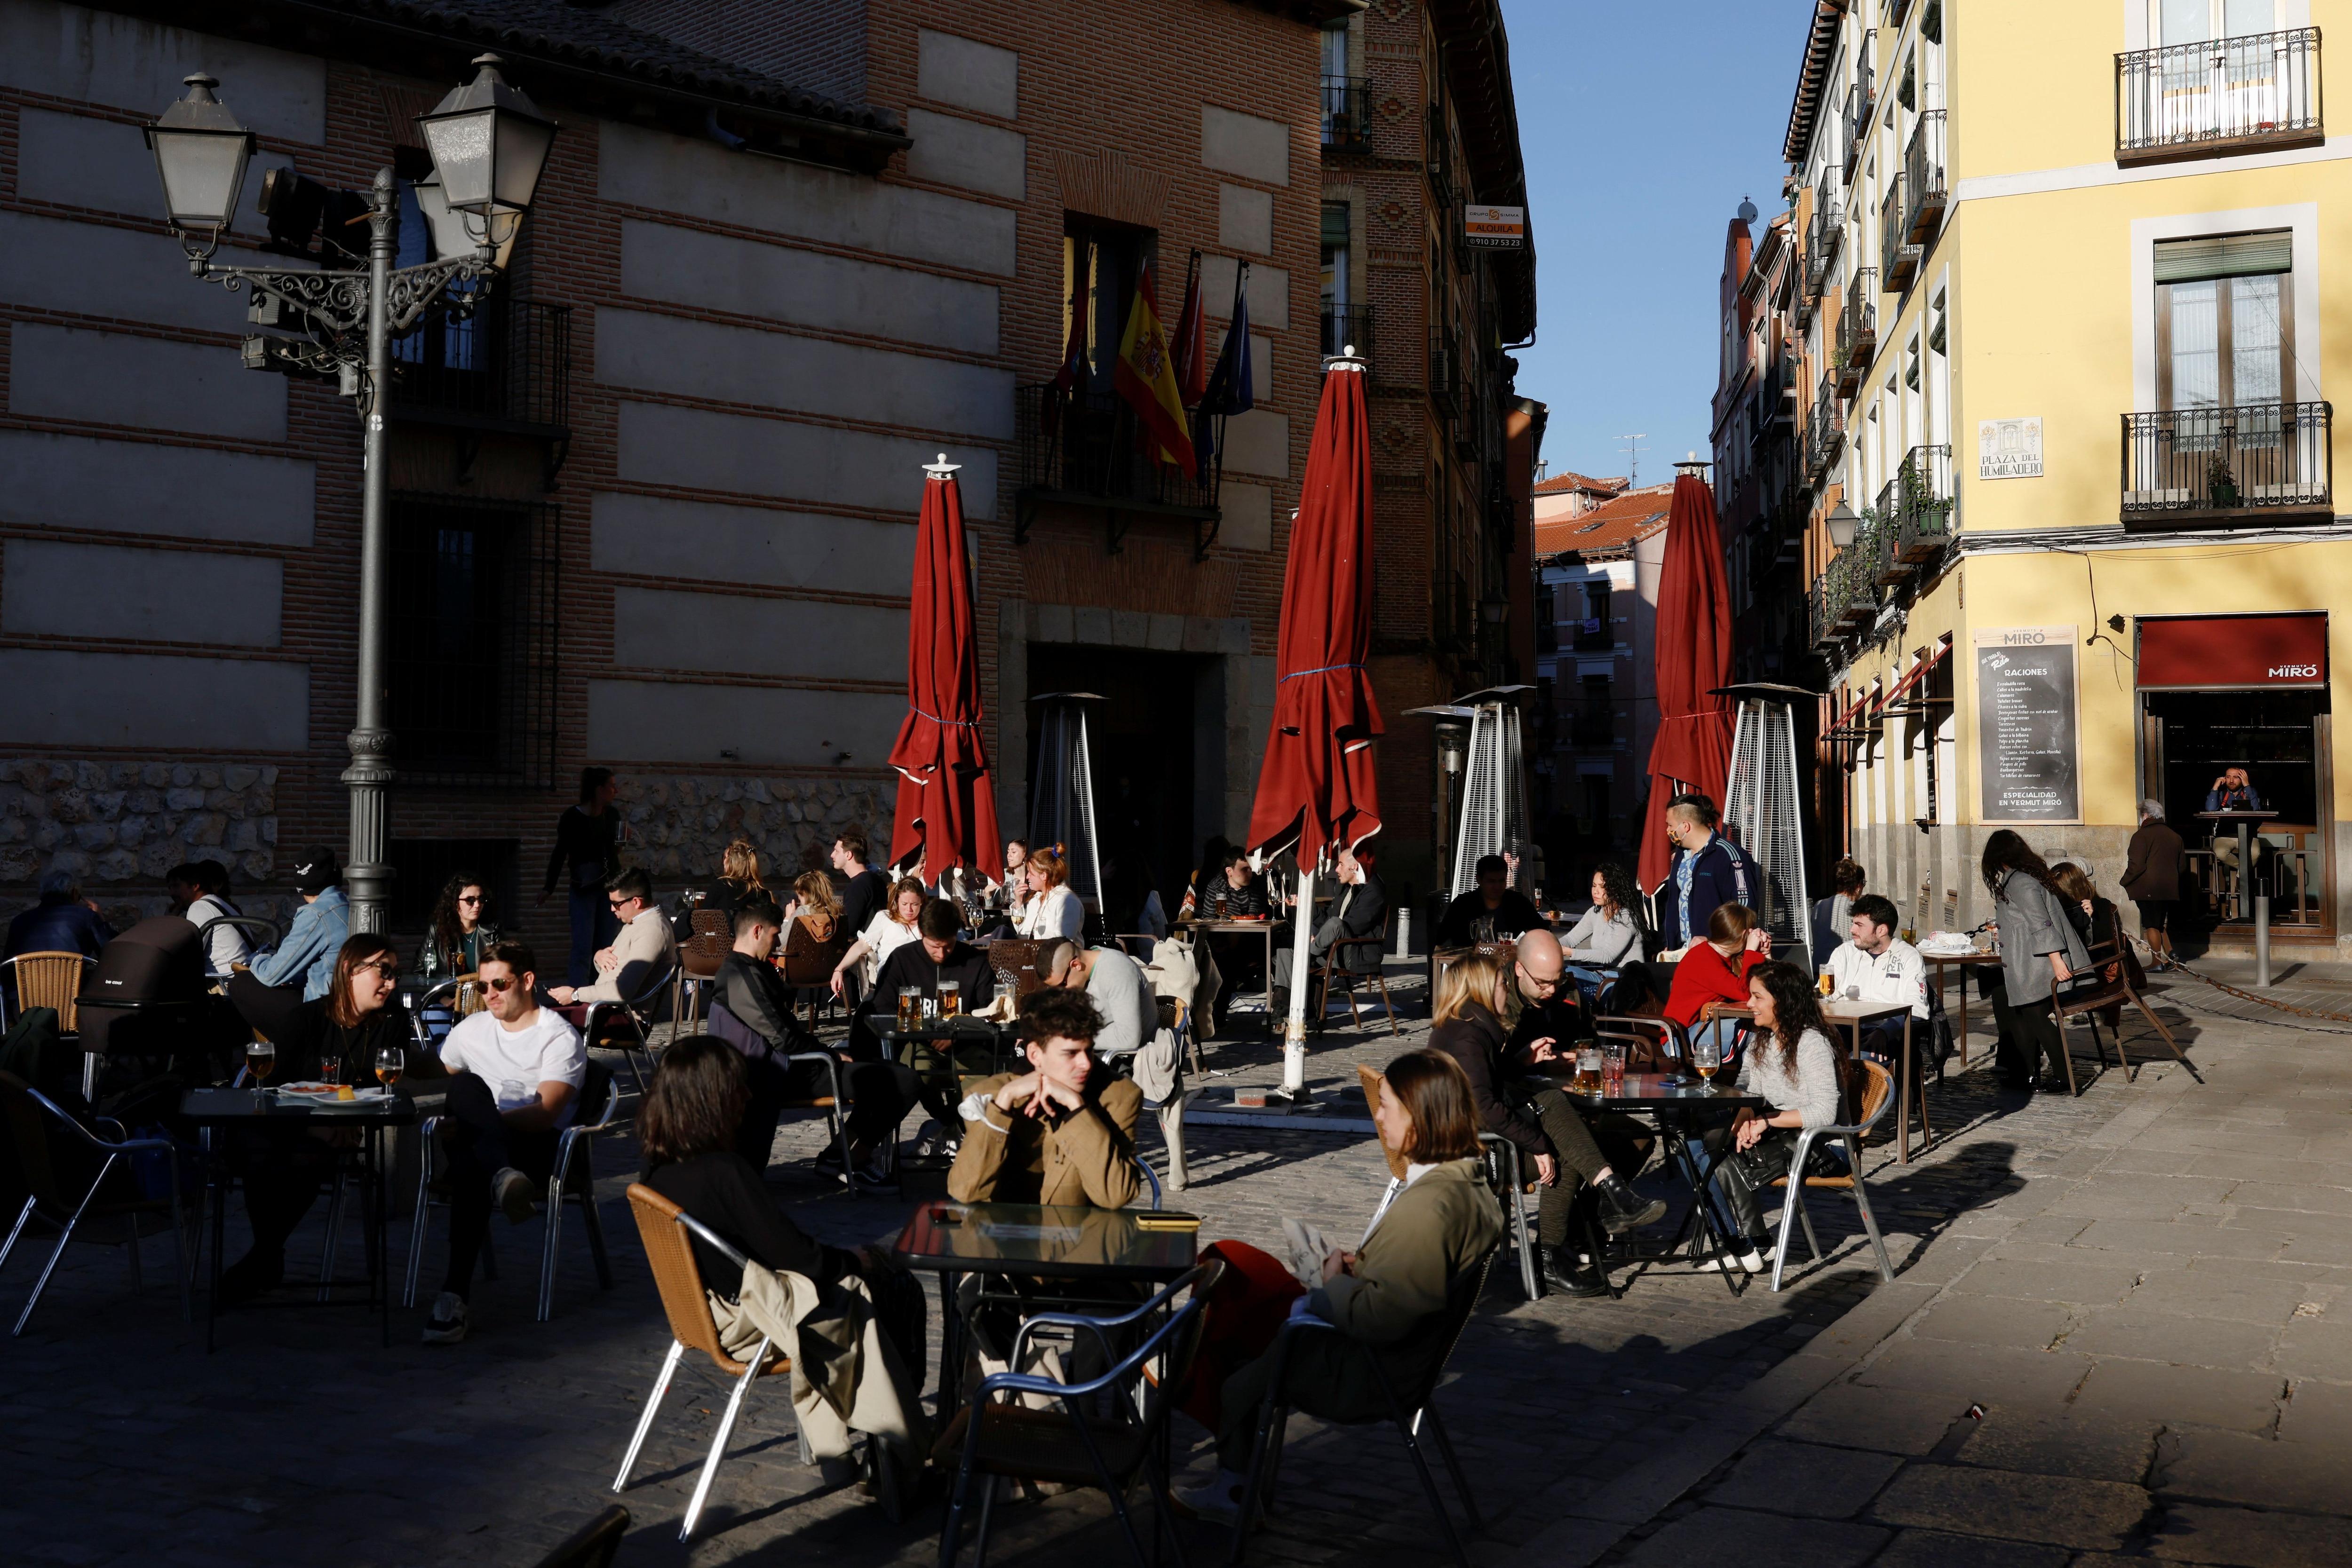 En los bares hoy se respeta la distancia social (Reuters)